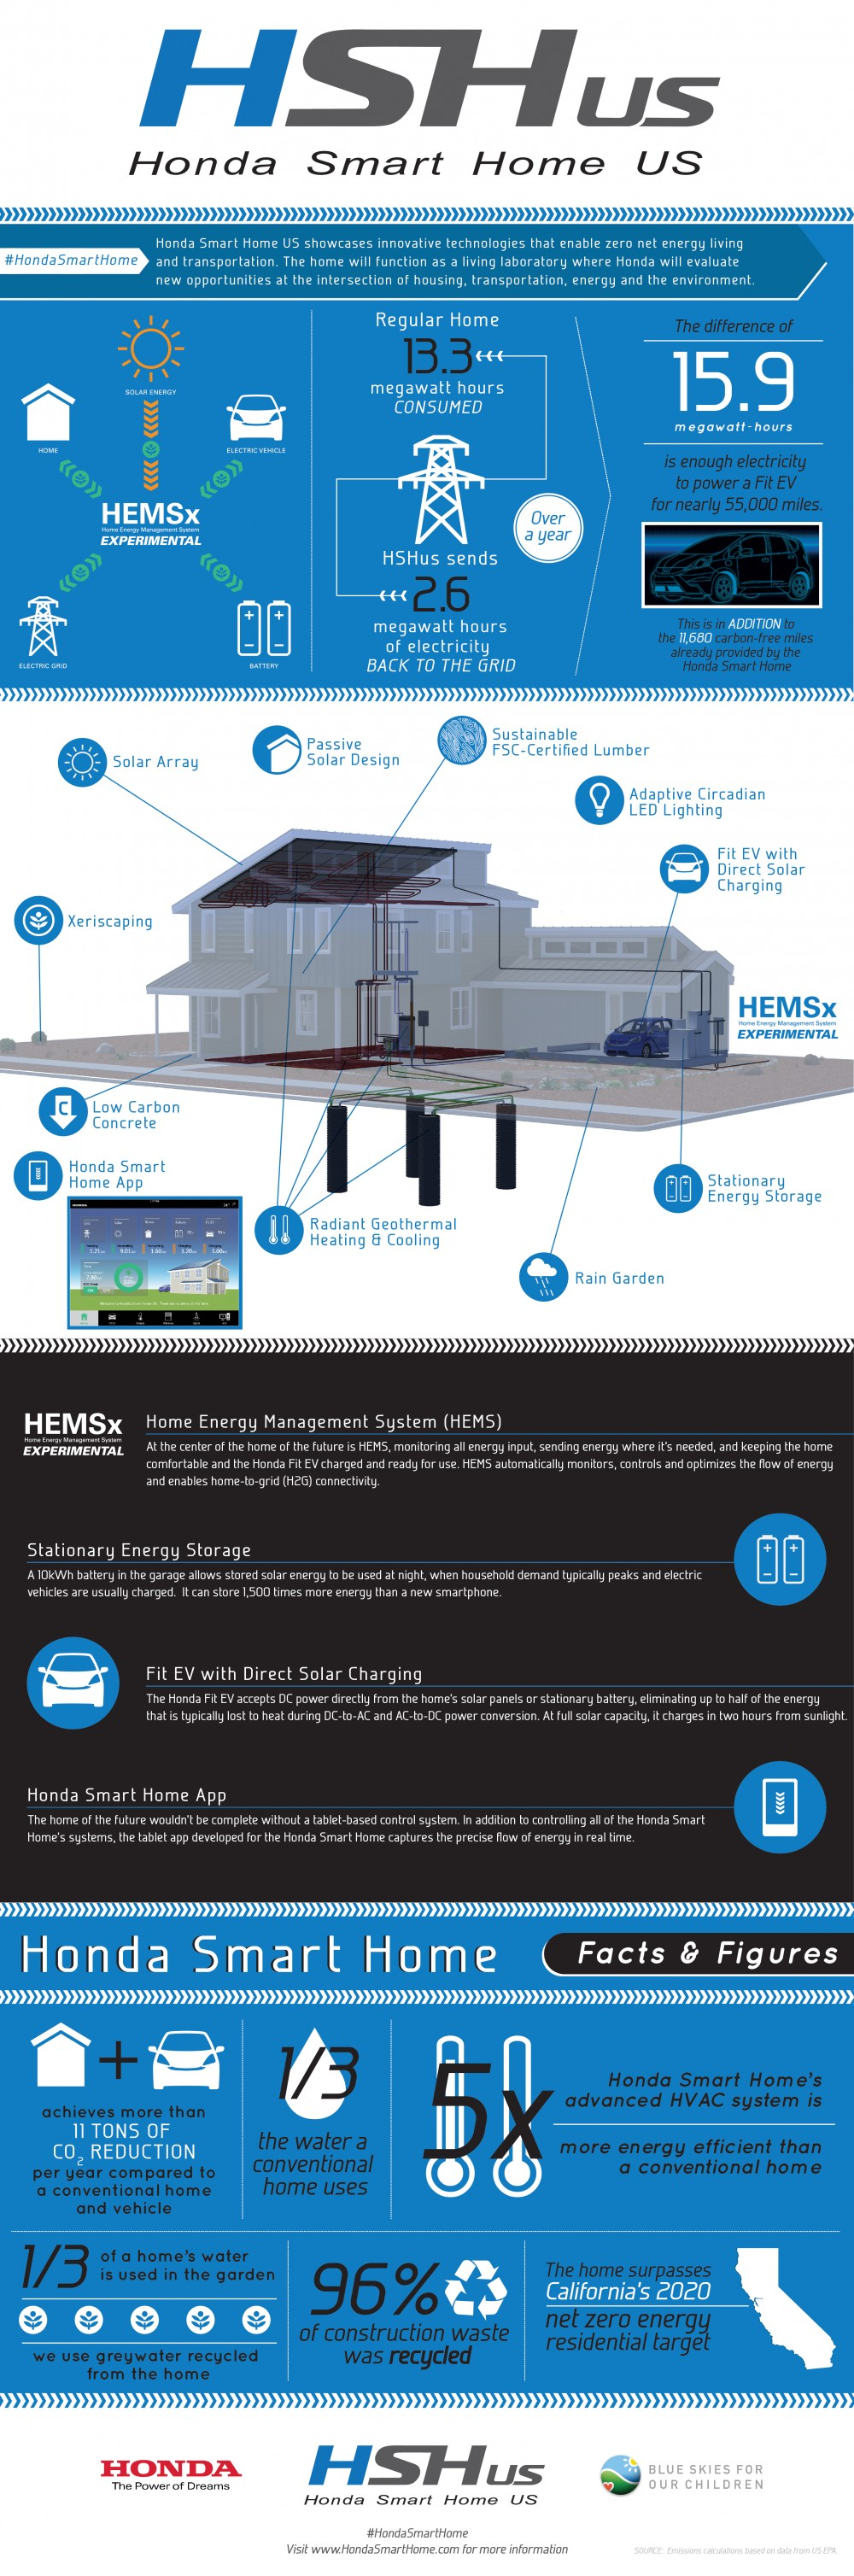 Honda smart home - ITGS case study